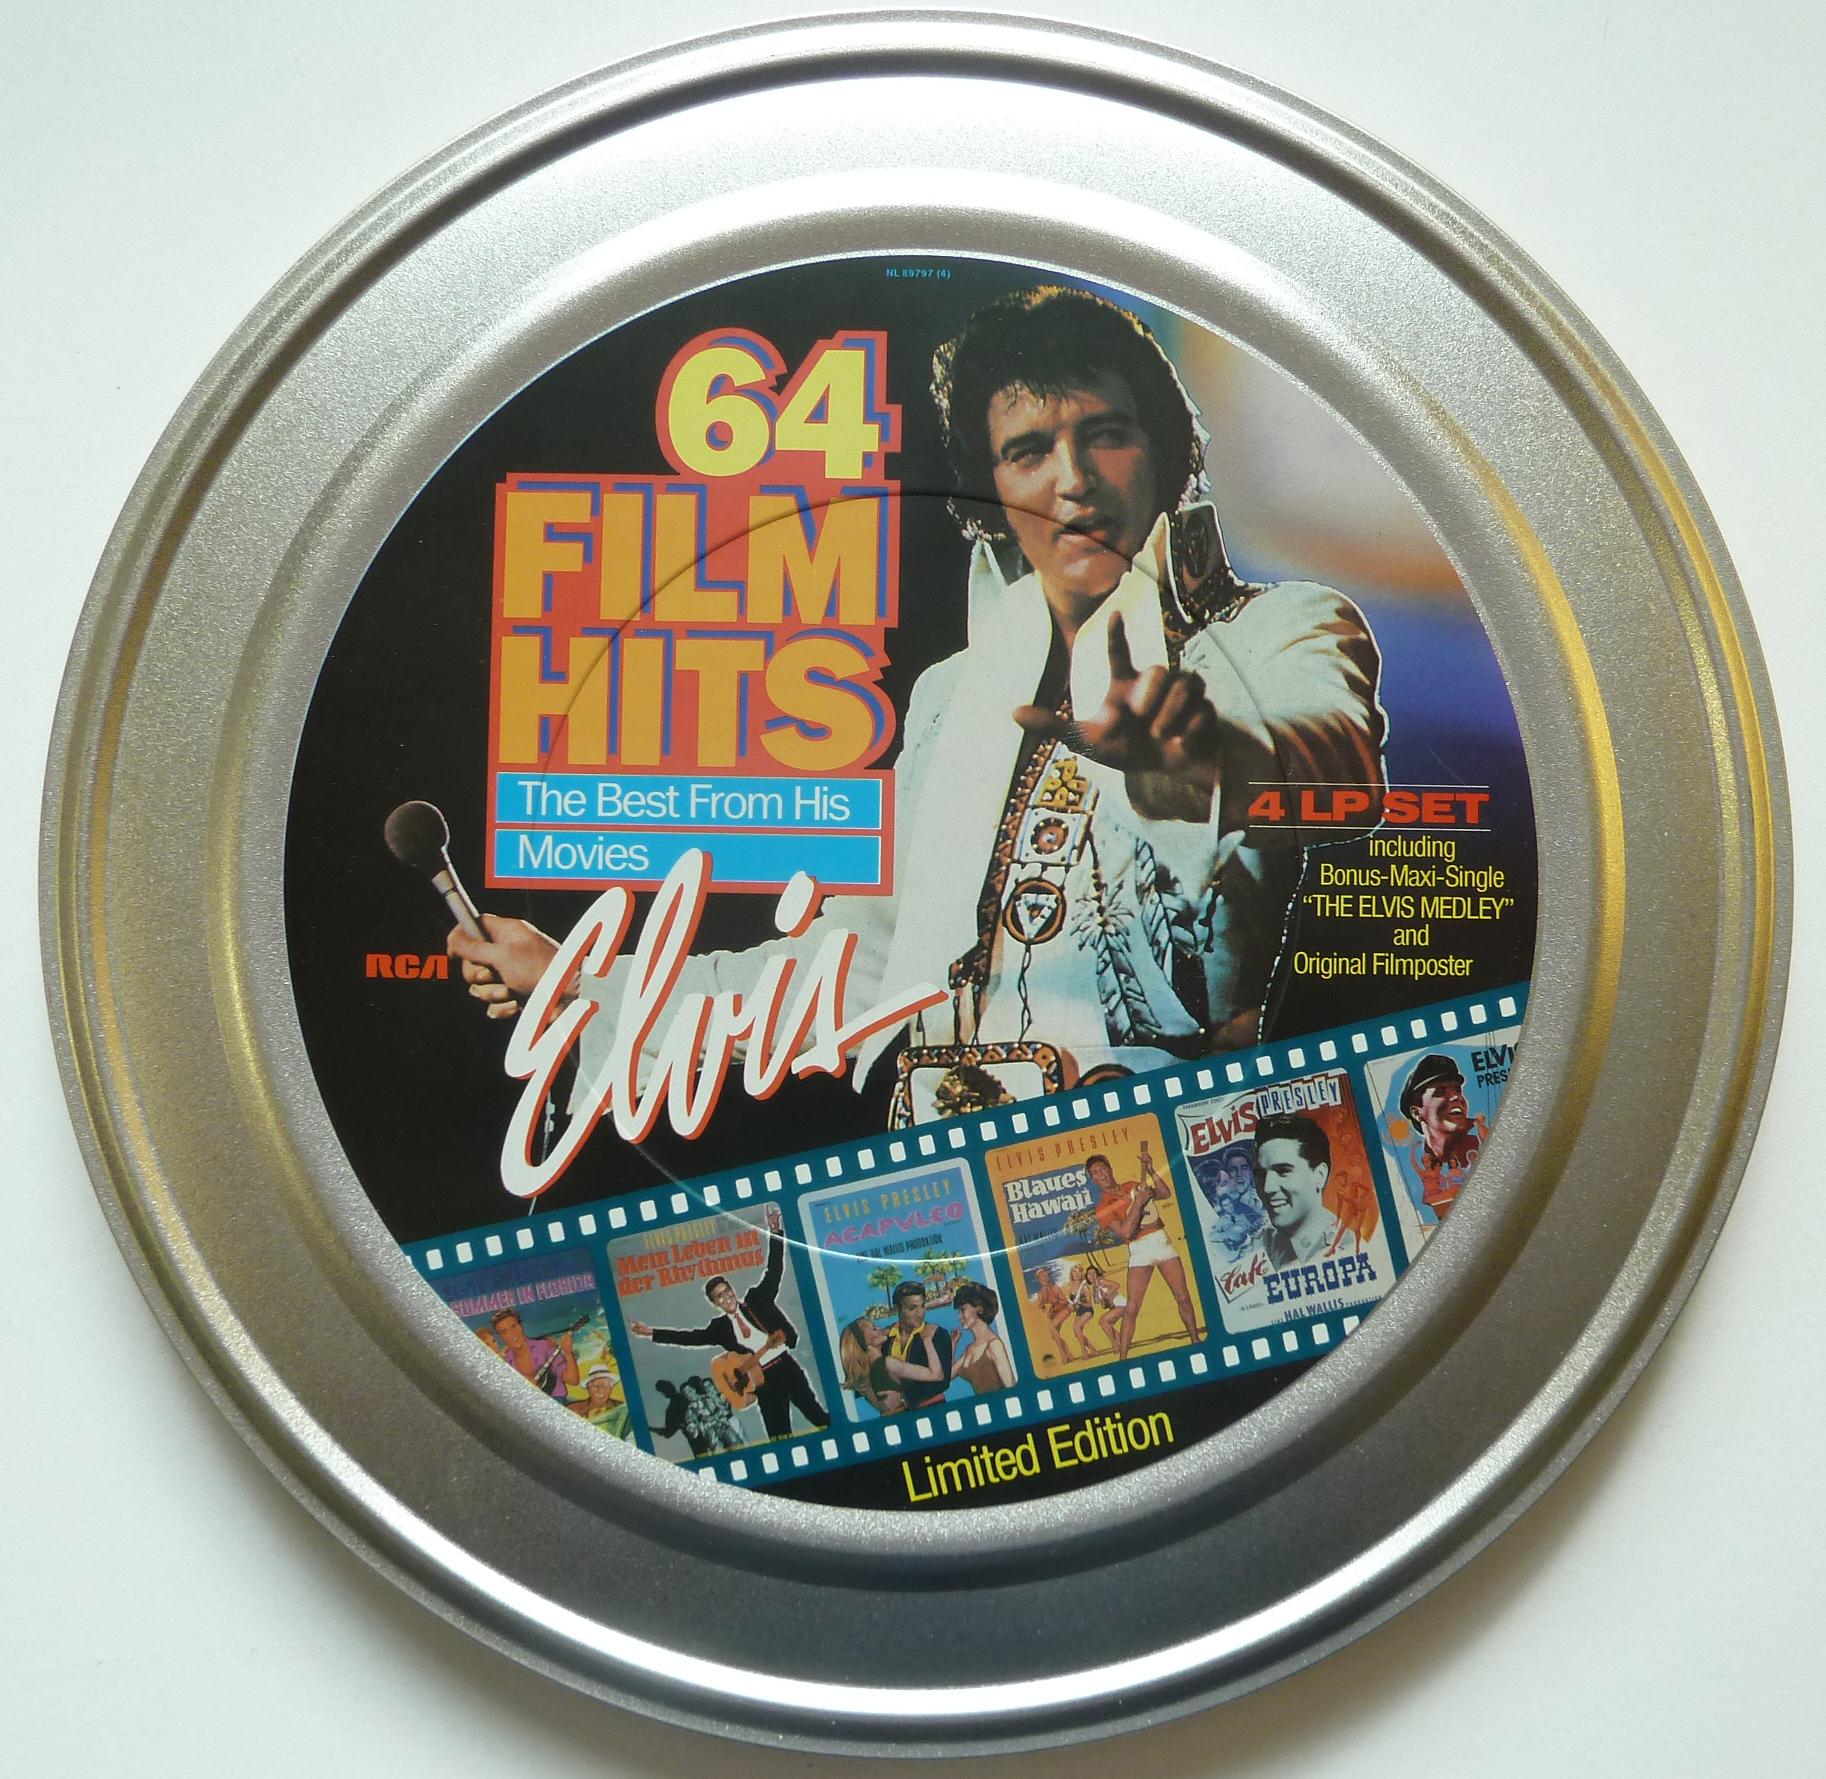 64 FILM HITS 64filmhitsfrontl7okm